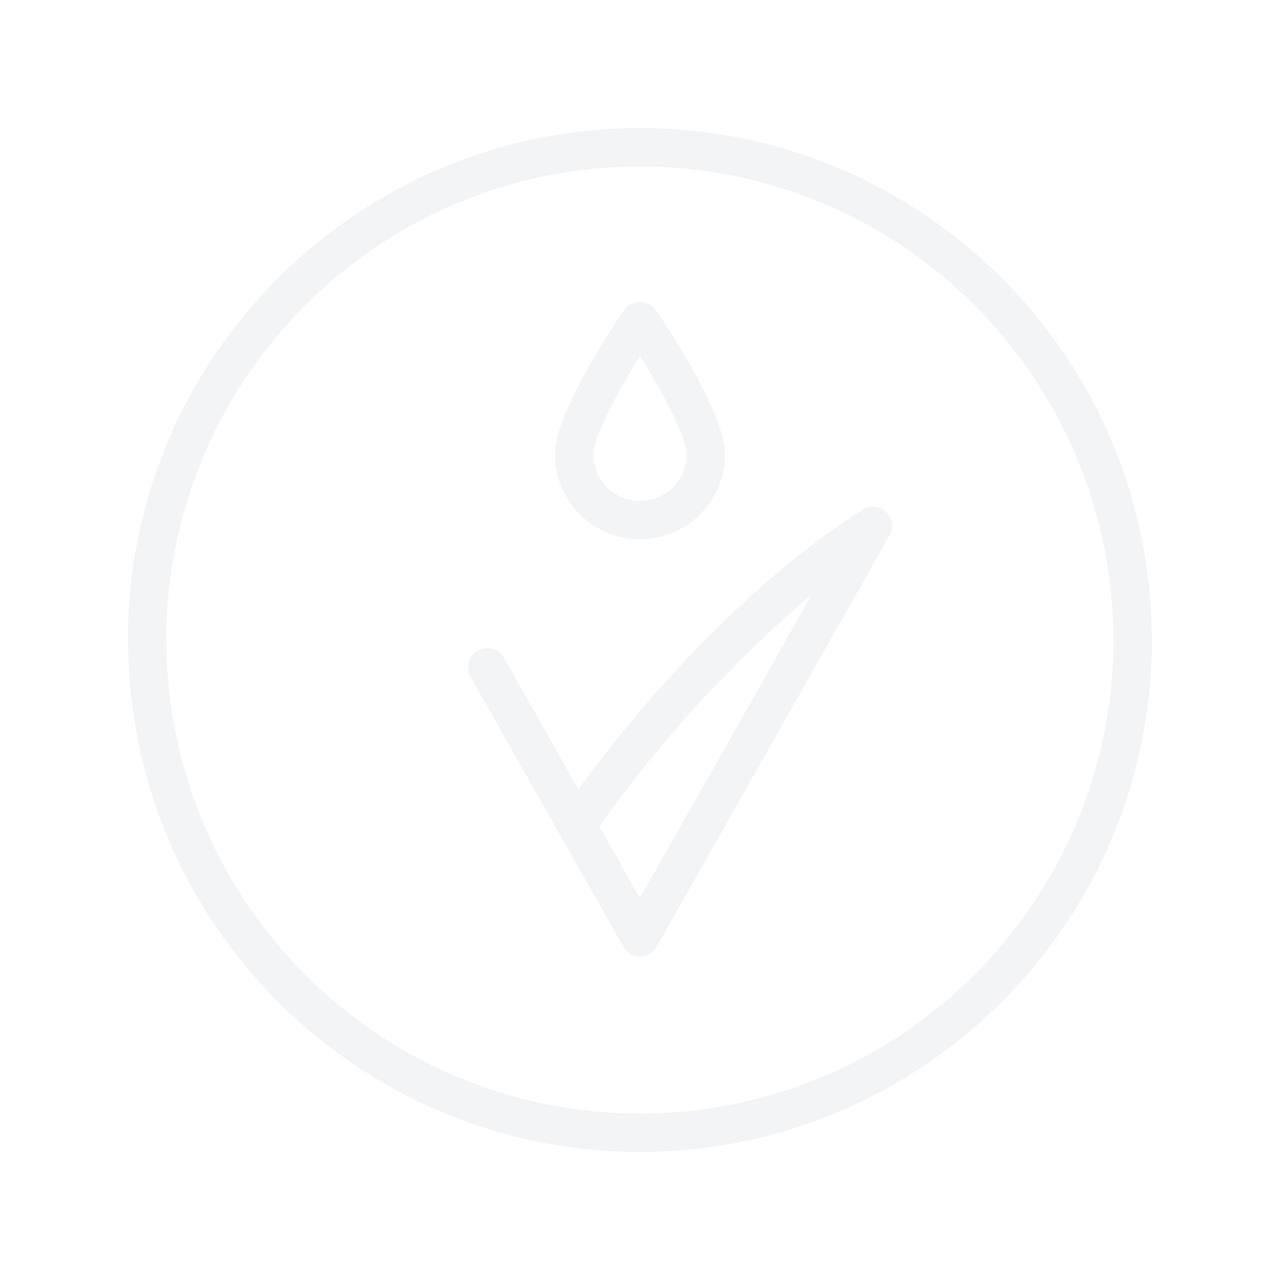 db96fa4d50d JANE IREDALE Glow Time Mineral BB Cream SPF25 No.BB1 50ml